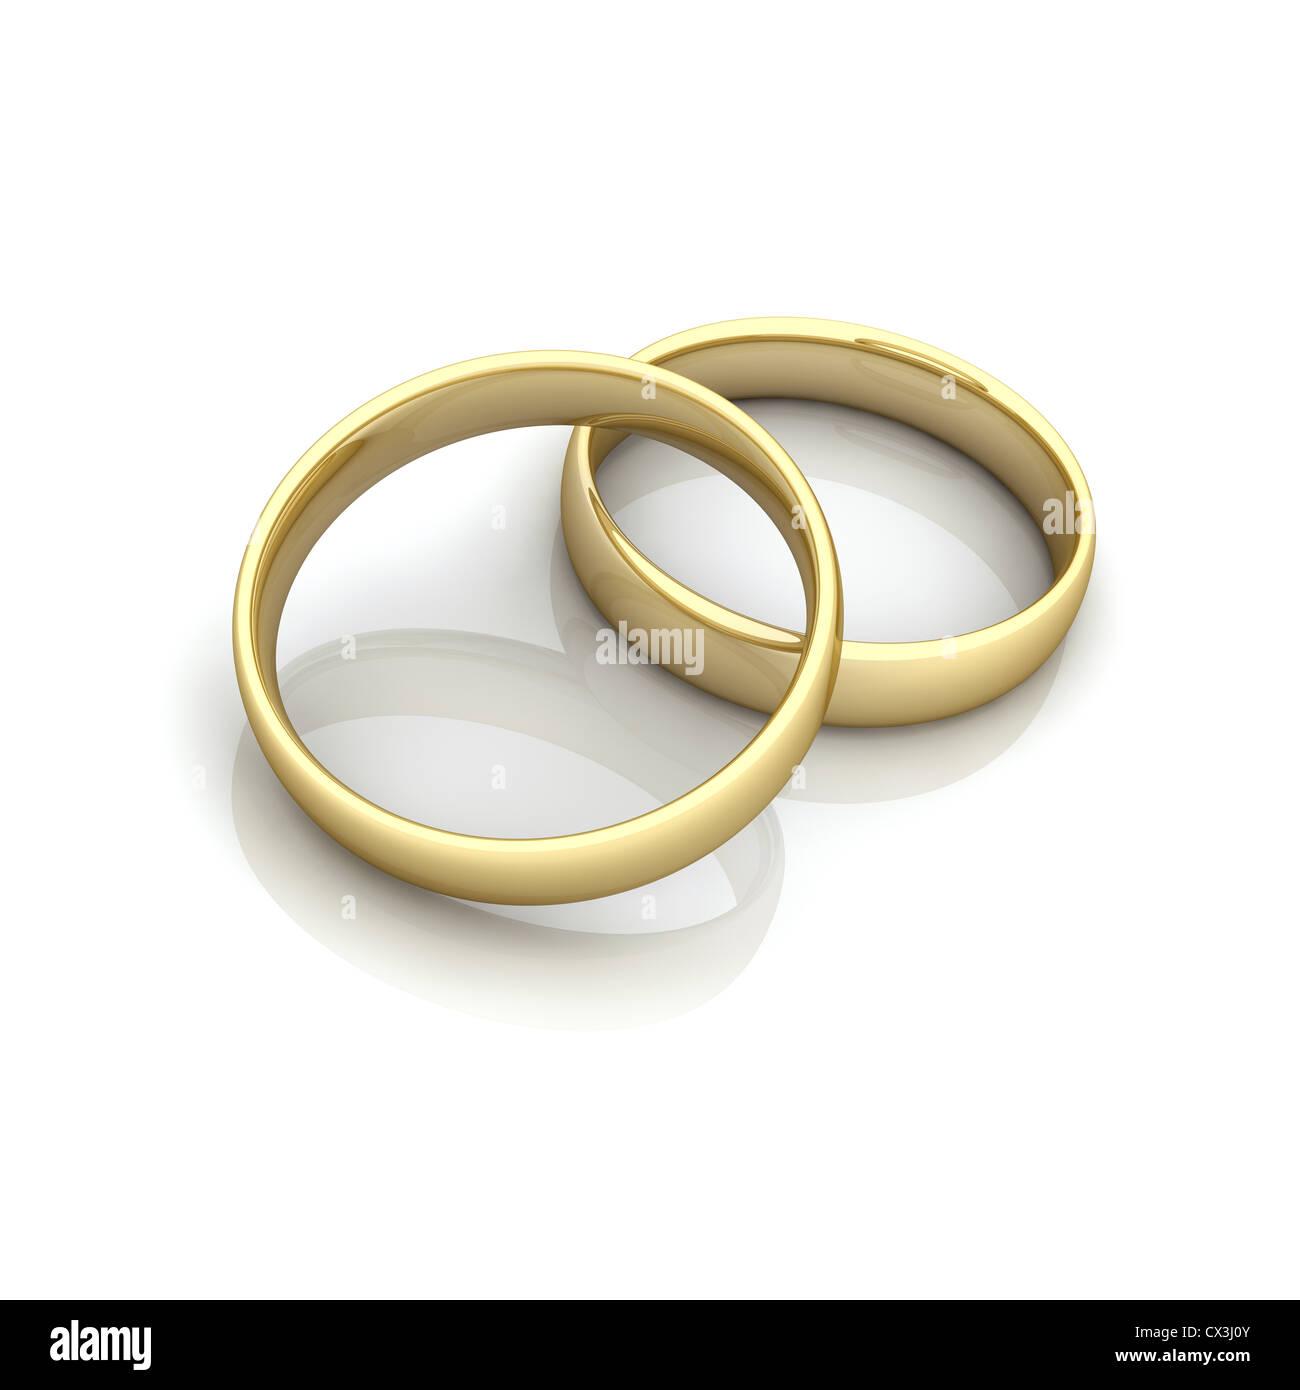 2 Ringe beieinander, symbole für Fusion / Heirat - 2 anneaux, symbole du mariage / fusion Photo Stock